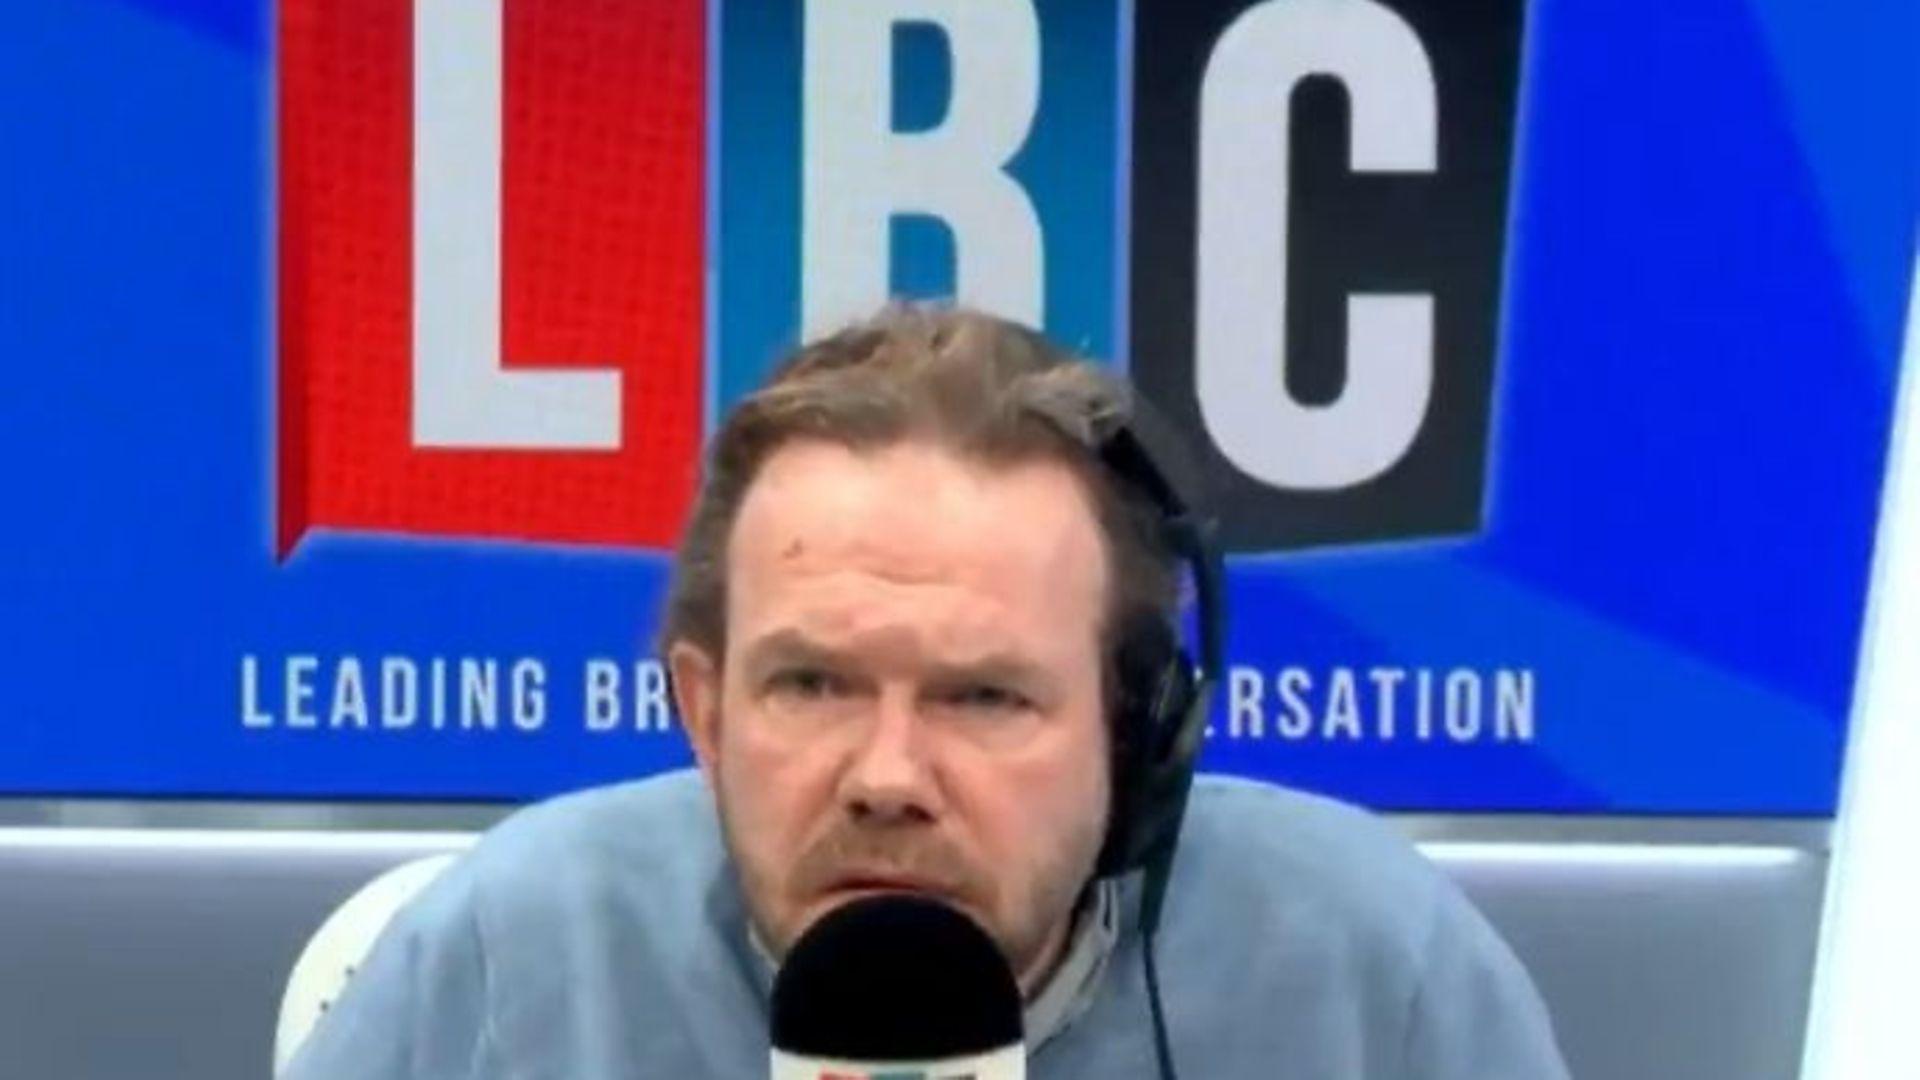 James O'Brien on LBC radio - Credit: LBC/Twitter